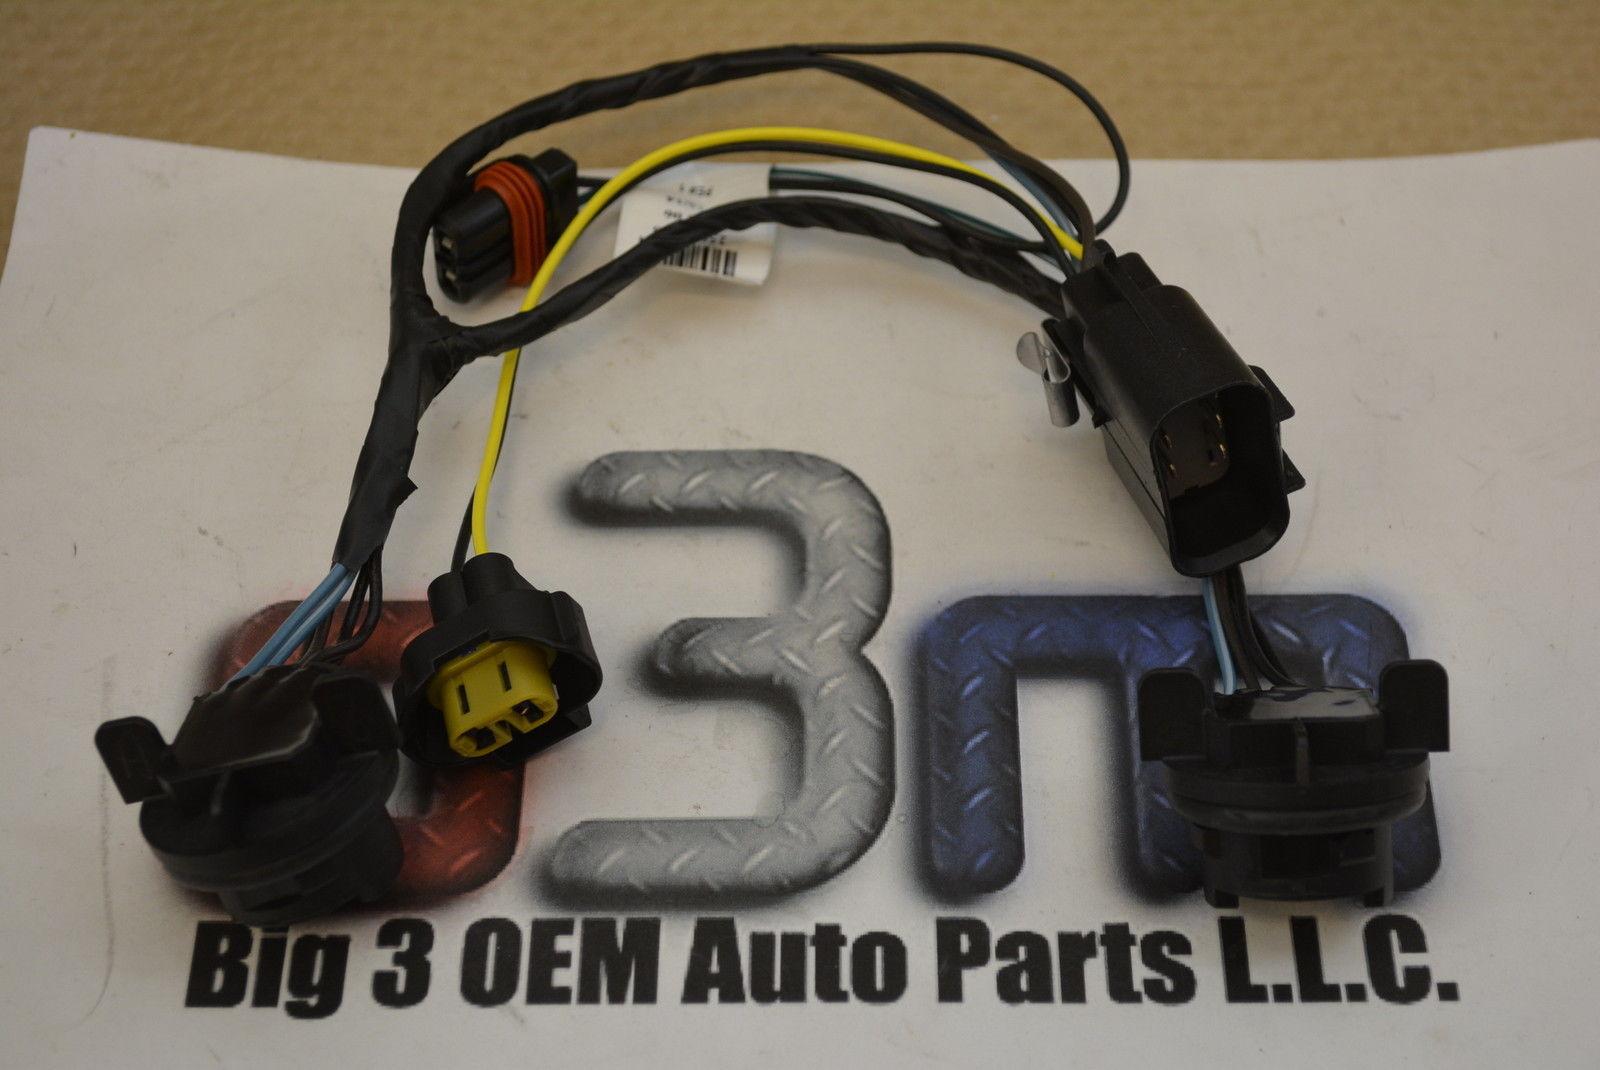 chevy cobalt headlight wiring harness wiring diagram 2007 chevy cobalt headlight wiring harness auto